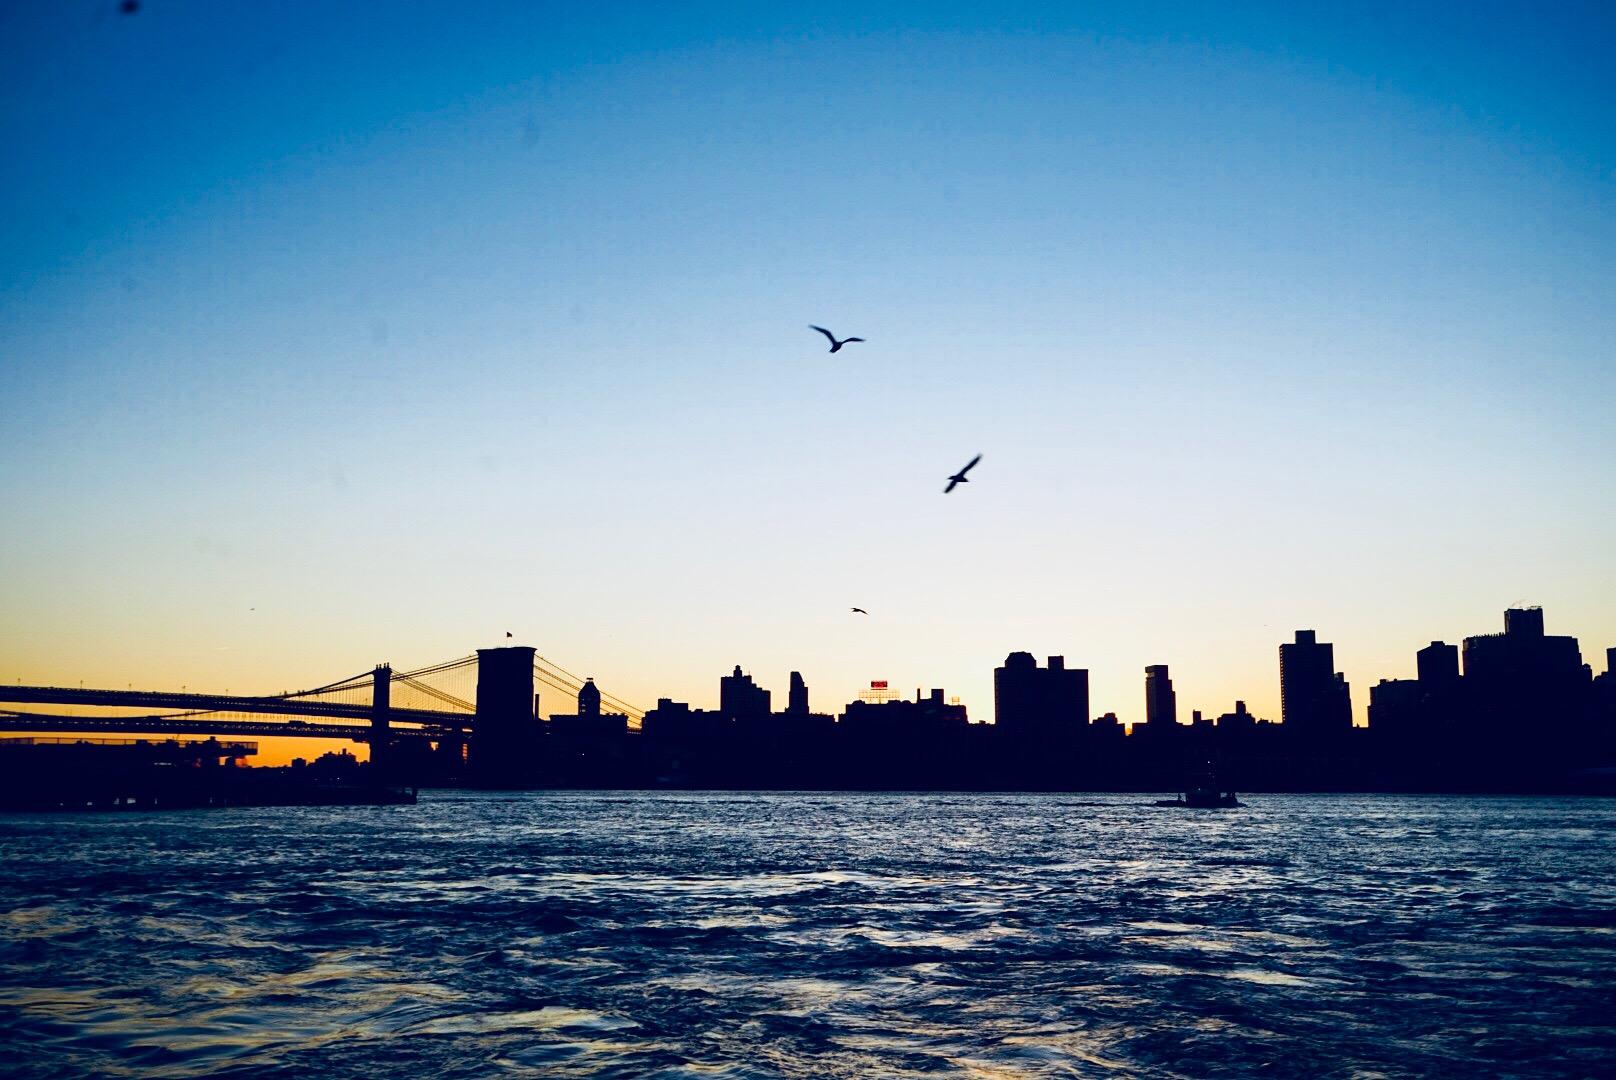 new-york-dish-you-were-here-nyc-luxury-food-travel (12).JPG